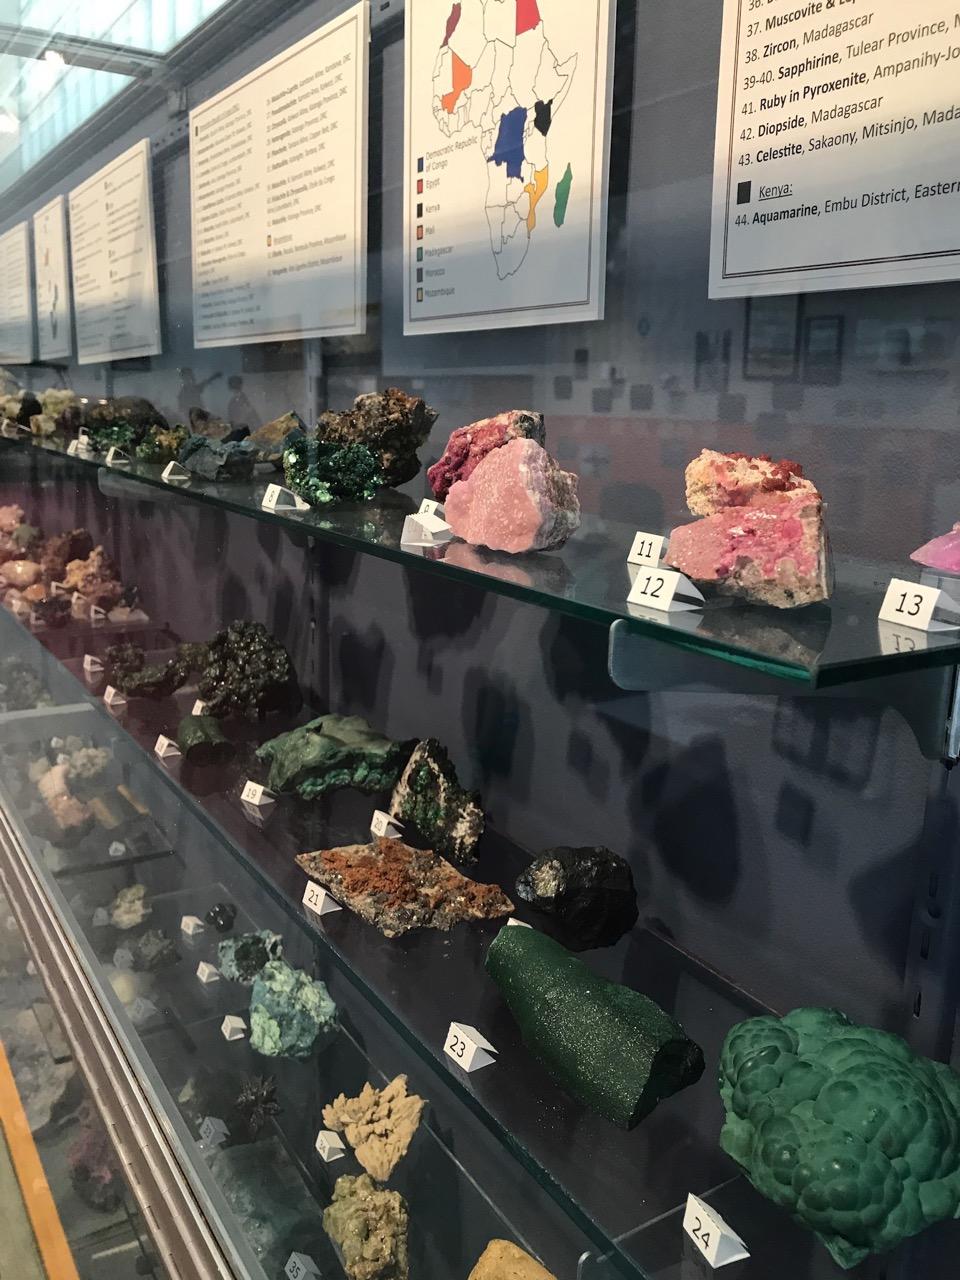 A display of minerals